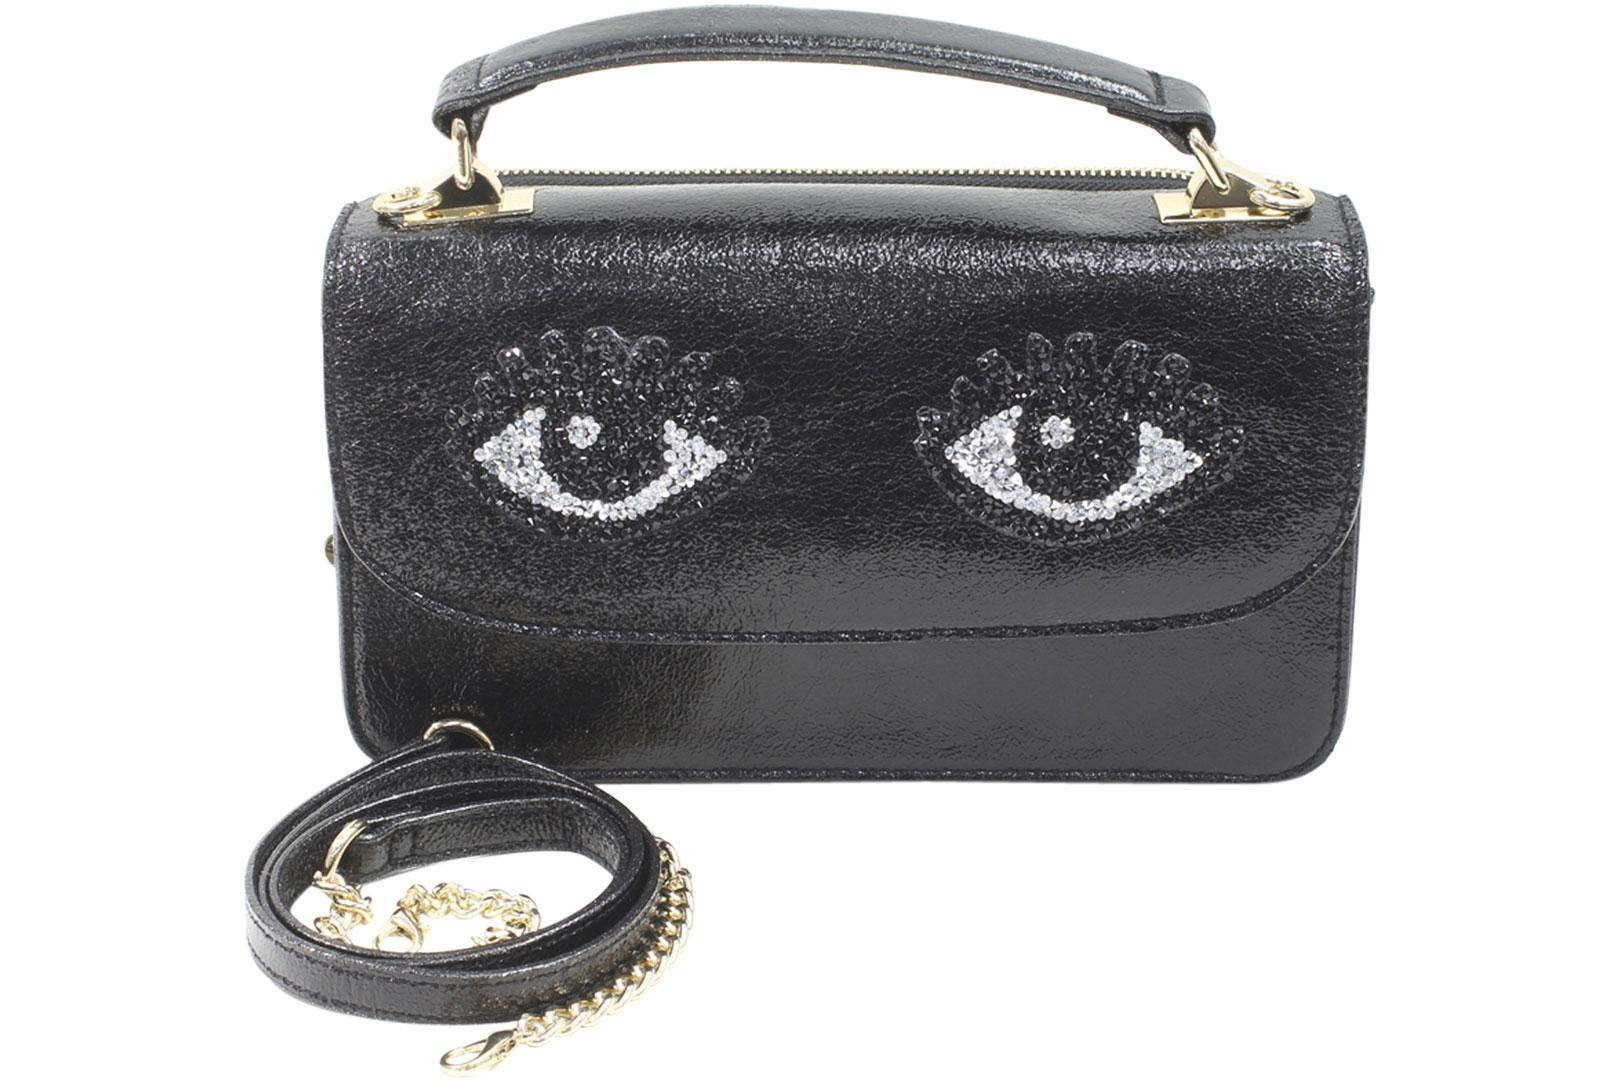 42de29bb6a48 Betsey Johnson Women s Eye-Catching Top Handle Crossbody Handbag